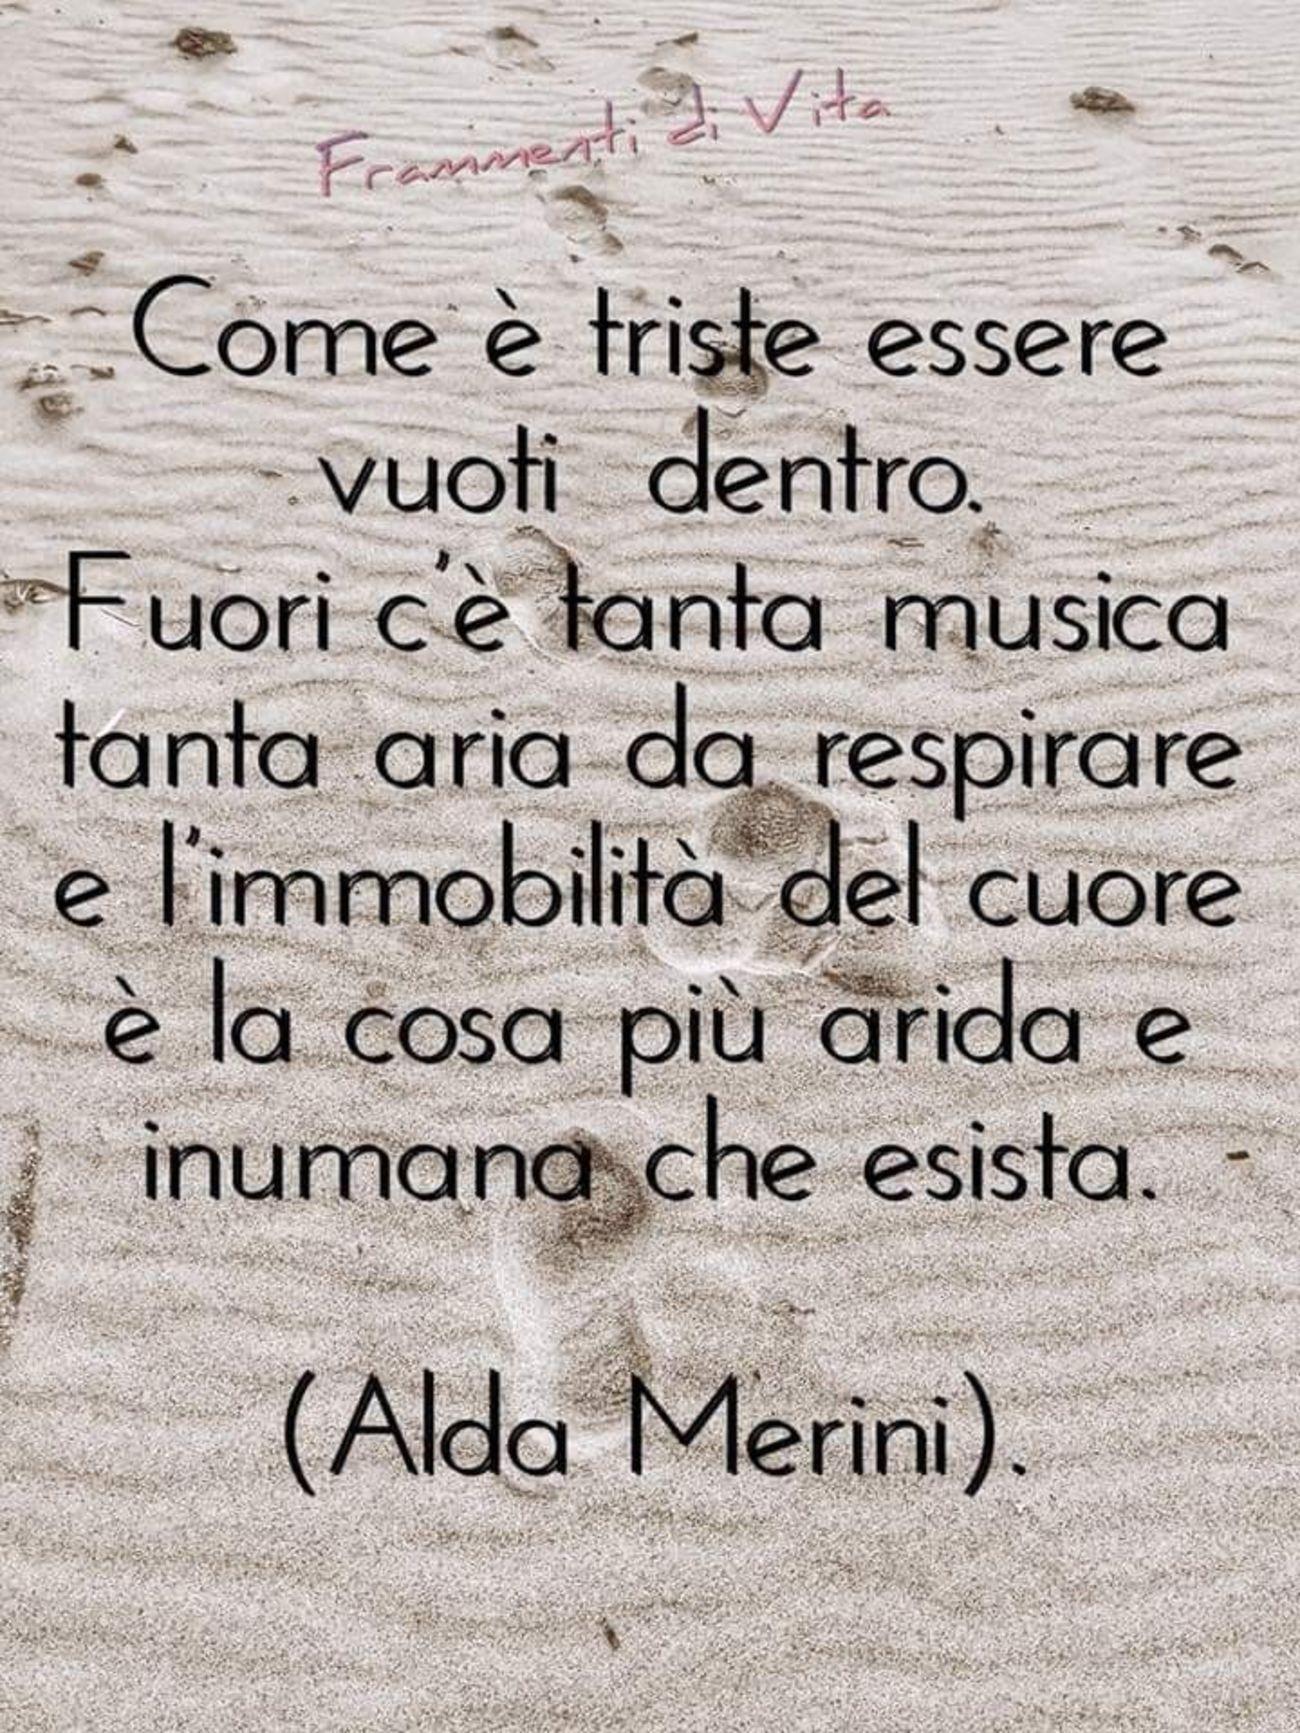 Verità Alda Merini